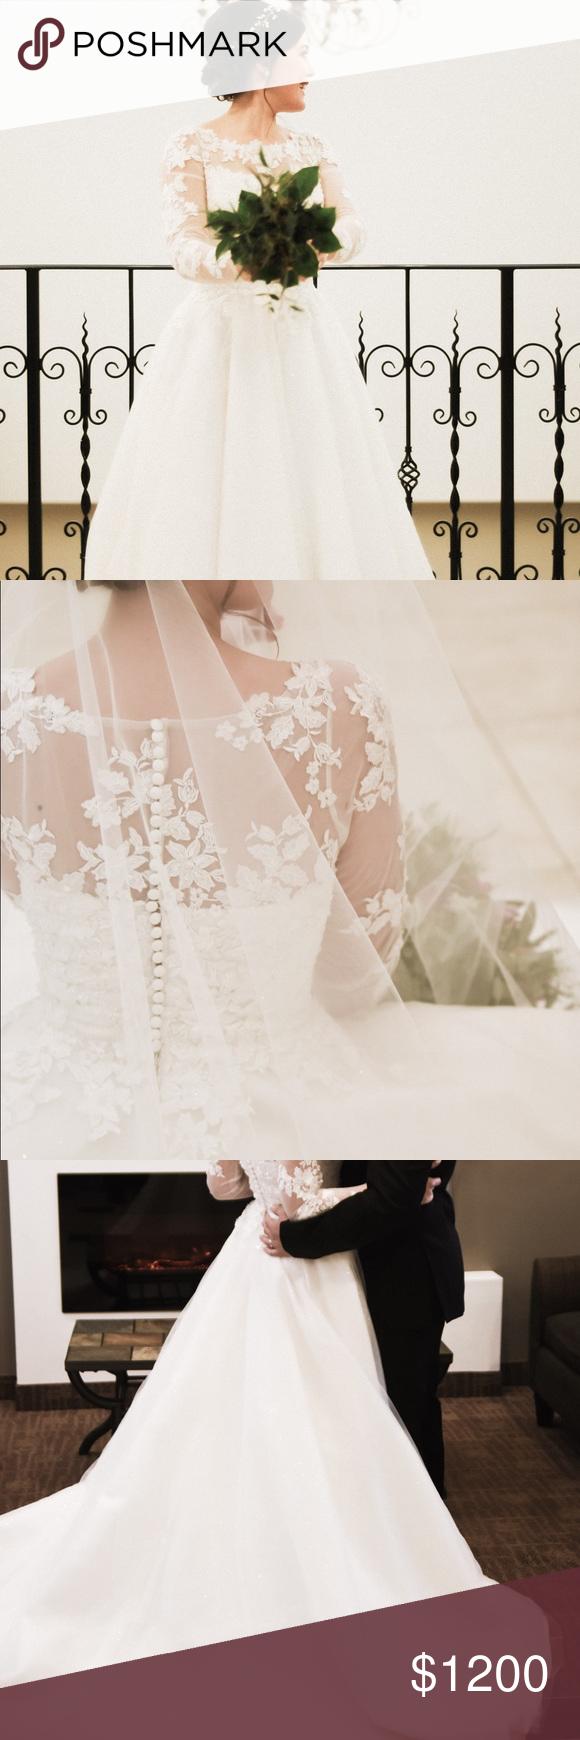 Long sleeve ivory lace wedding dress my posh picks pinterest